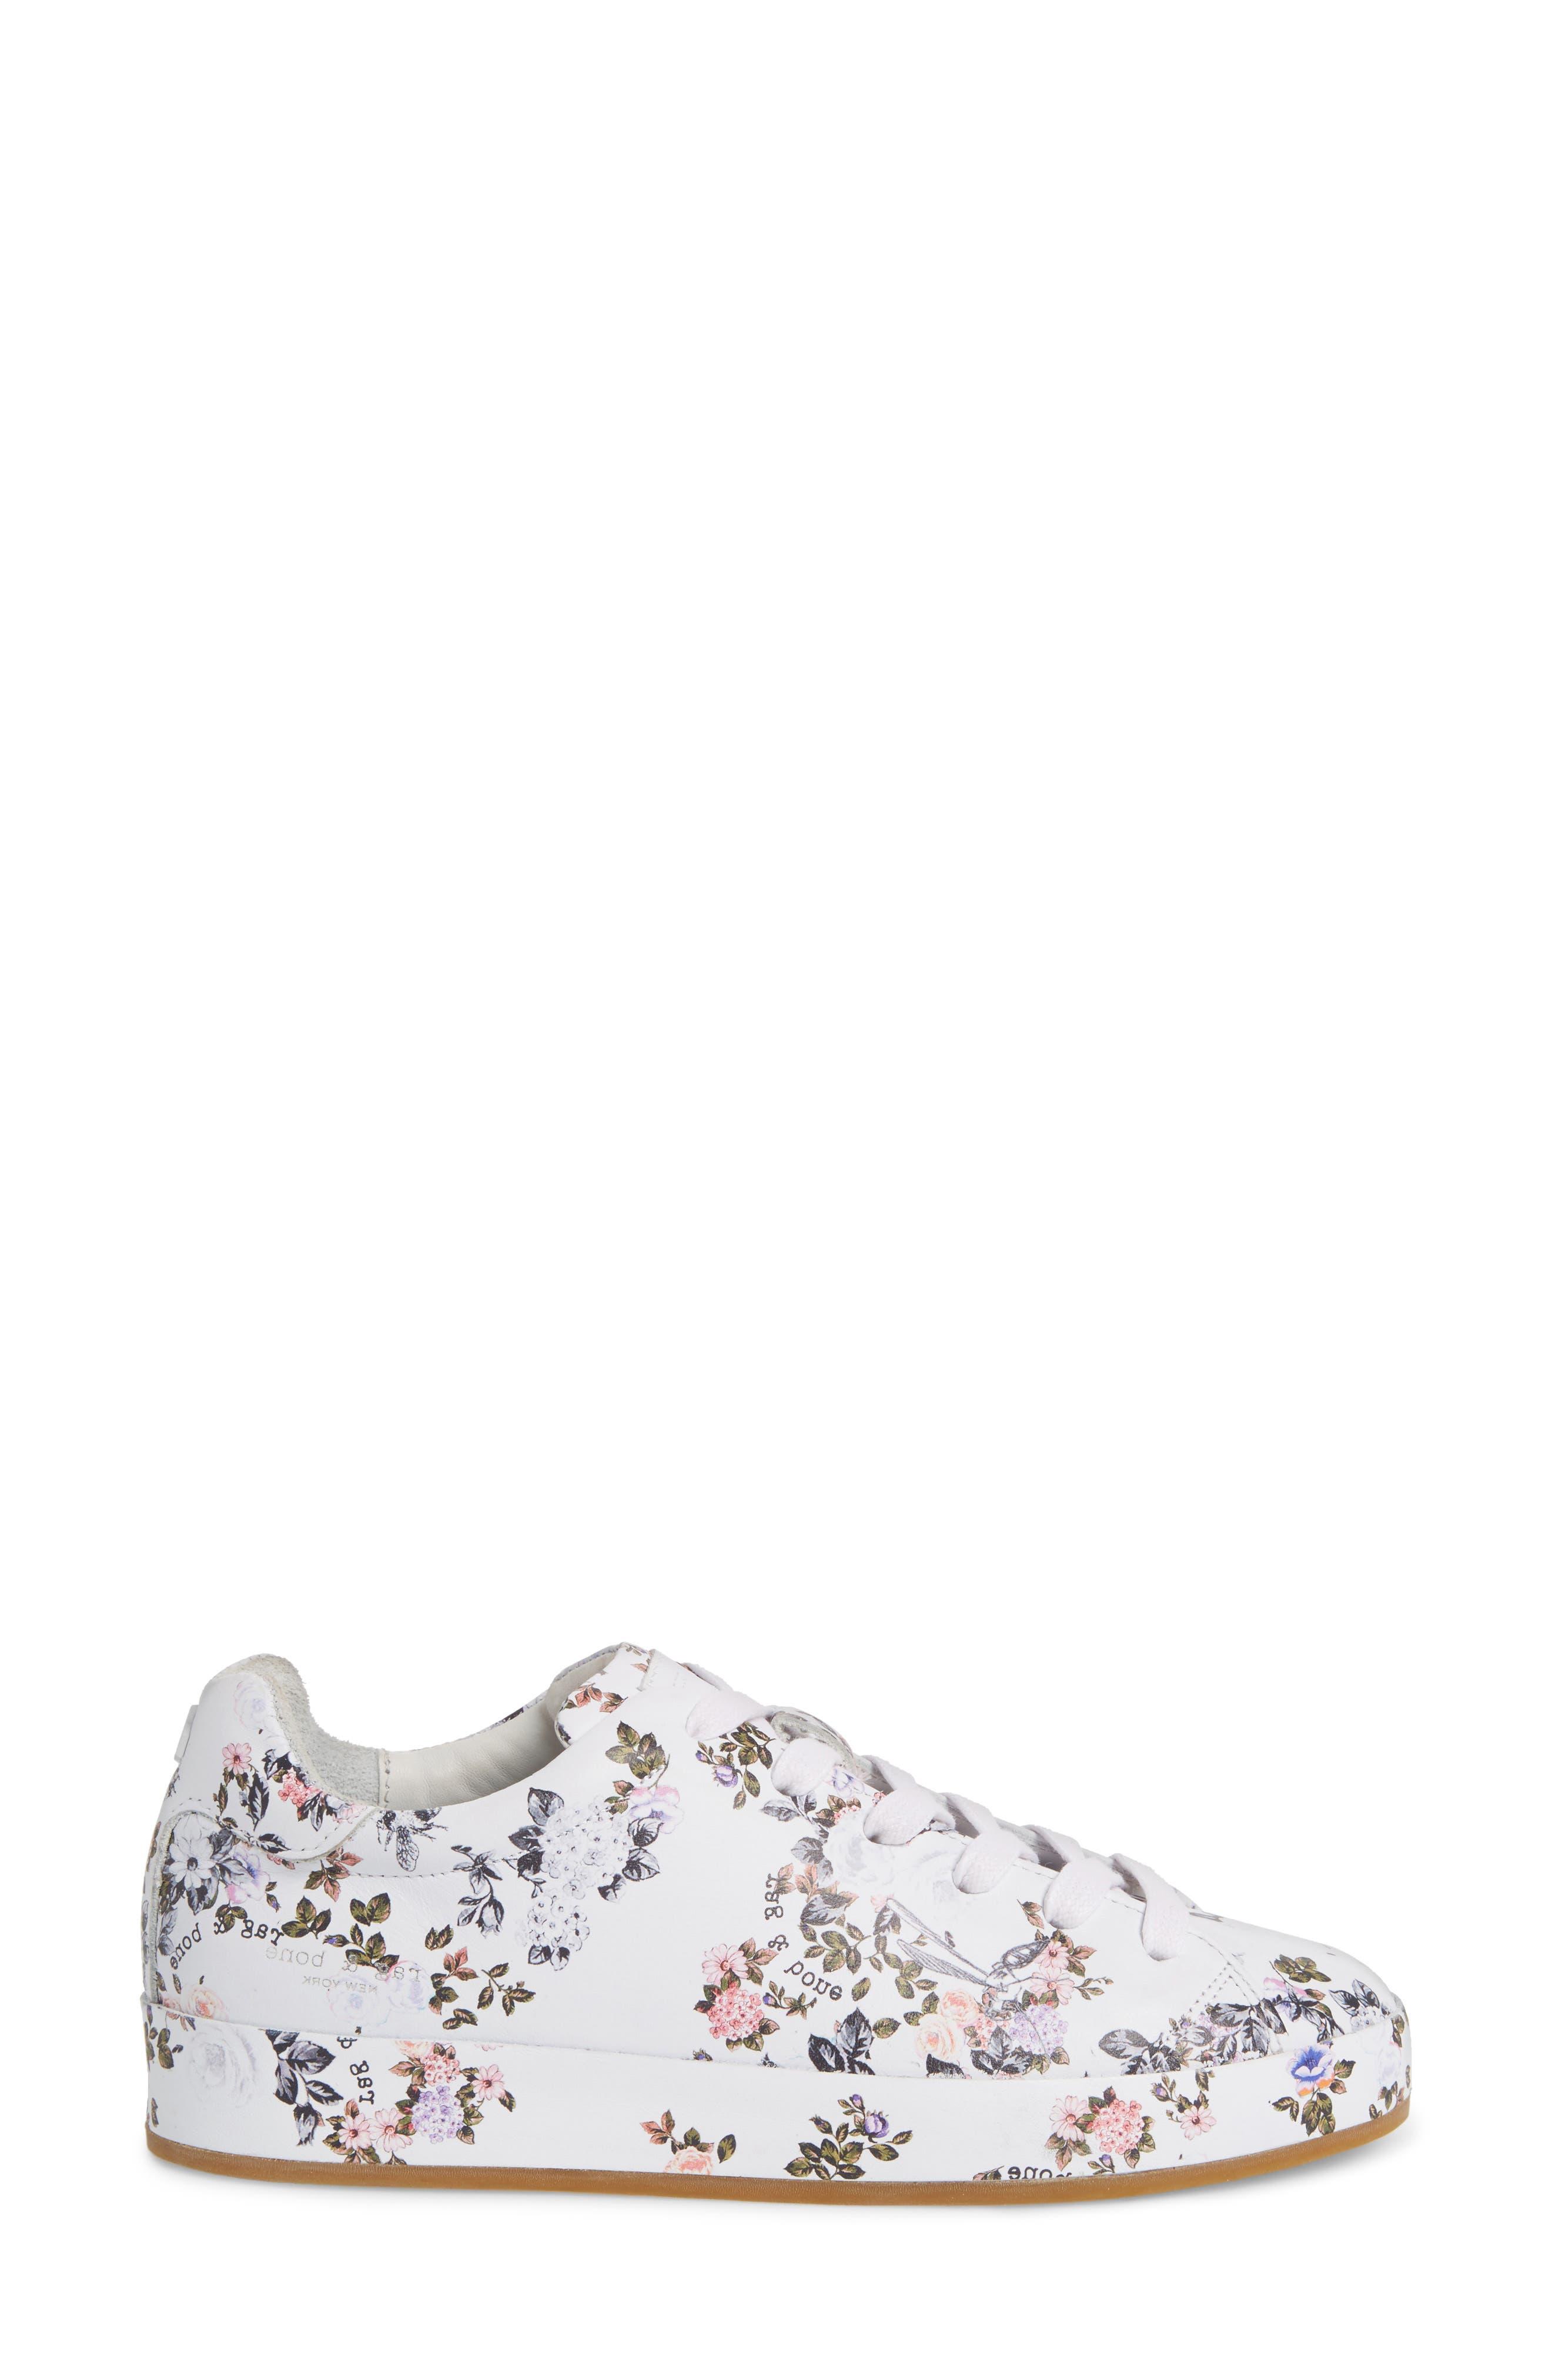 RB1 Low-Top Sneaker,                             Alternate thumbnail 3, color,                             Garden Florl